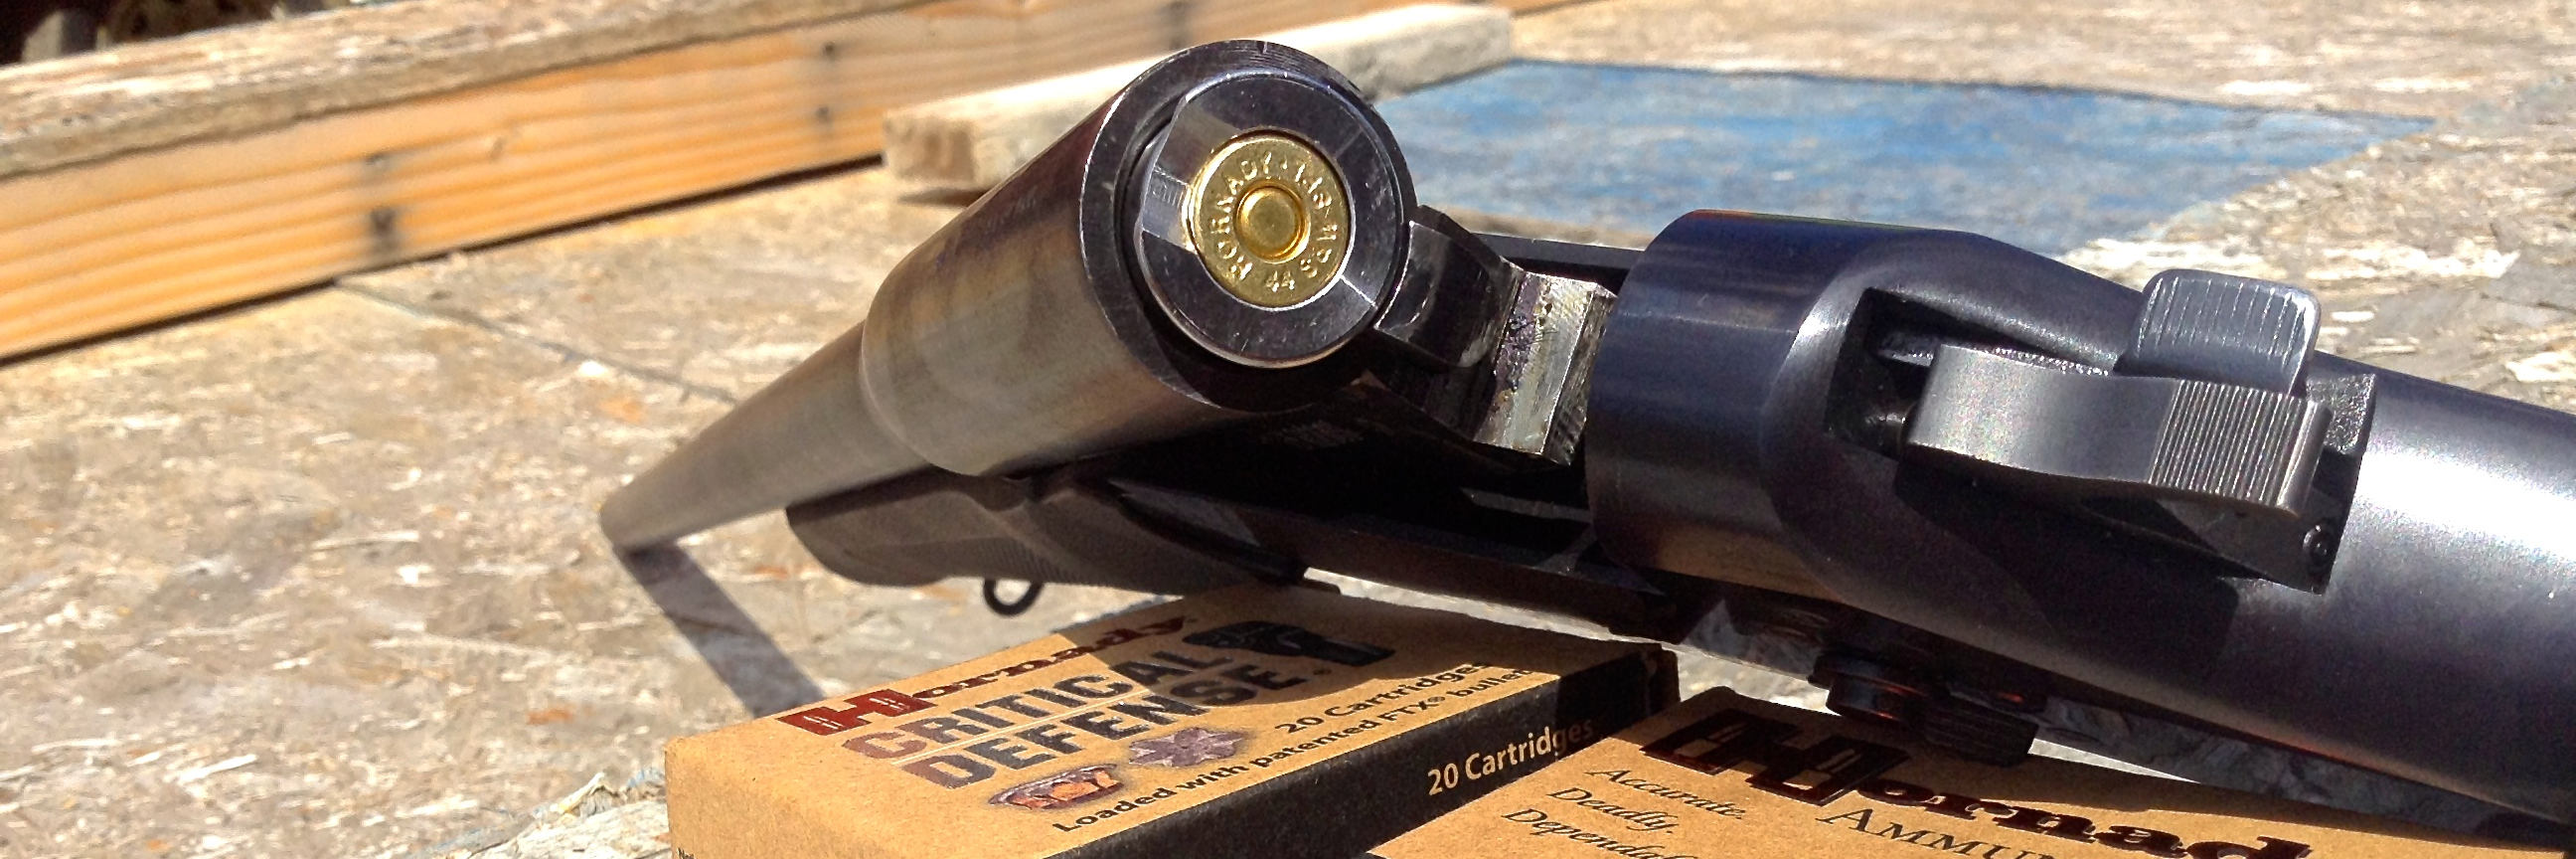 New Pathfinder Series 12 Gauge to 44 Special Buy Now!